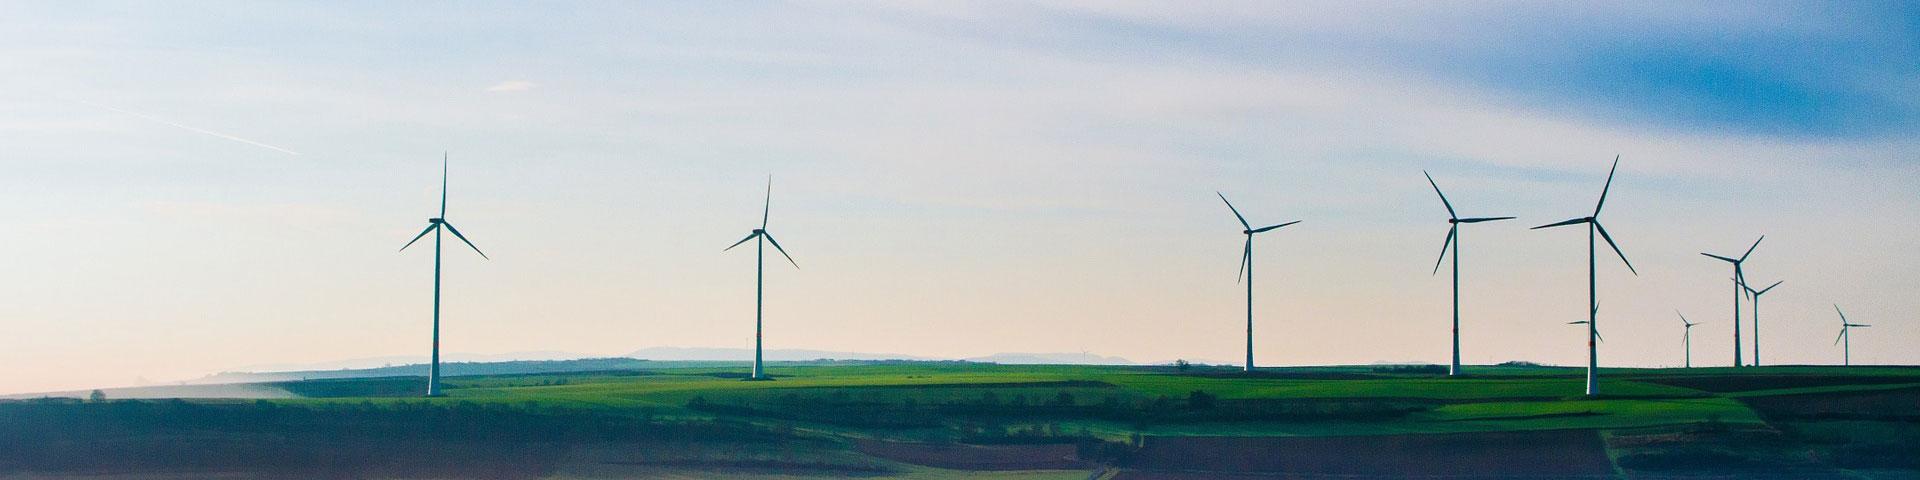 energie van windmolens